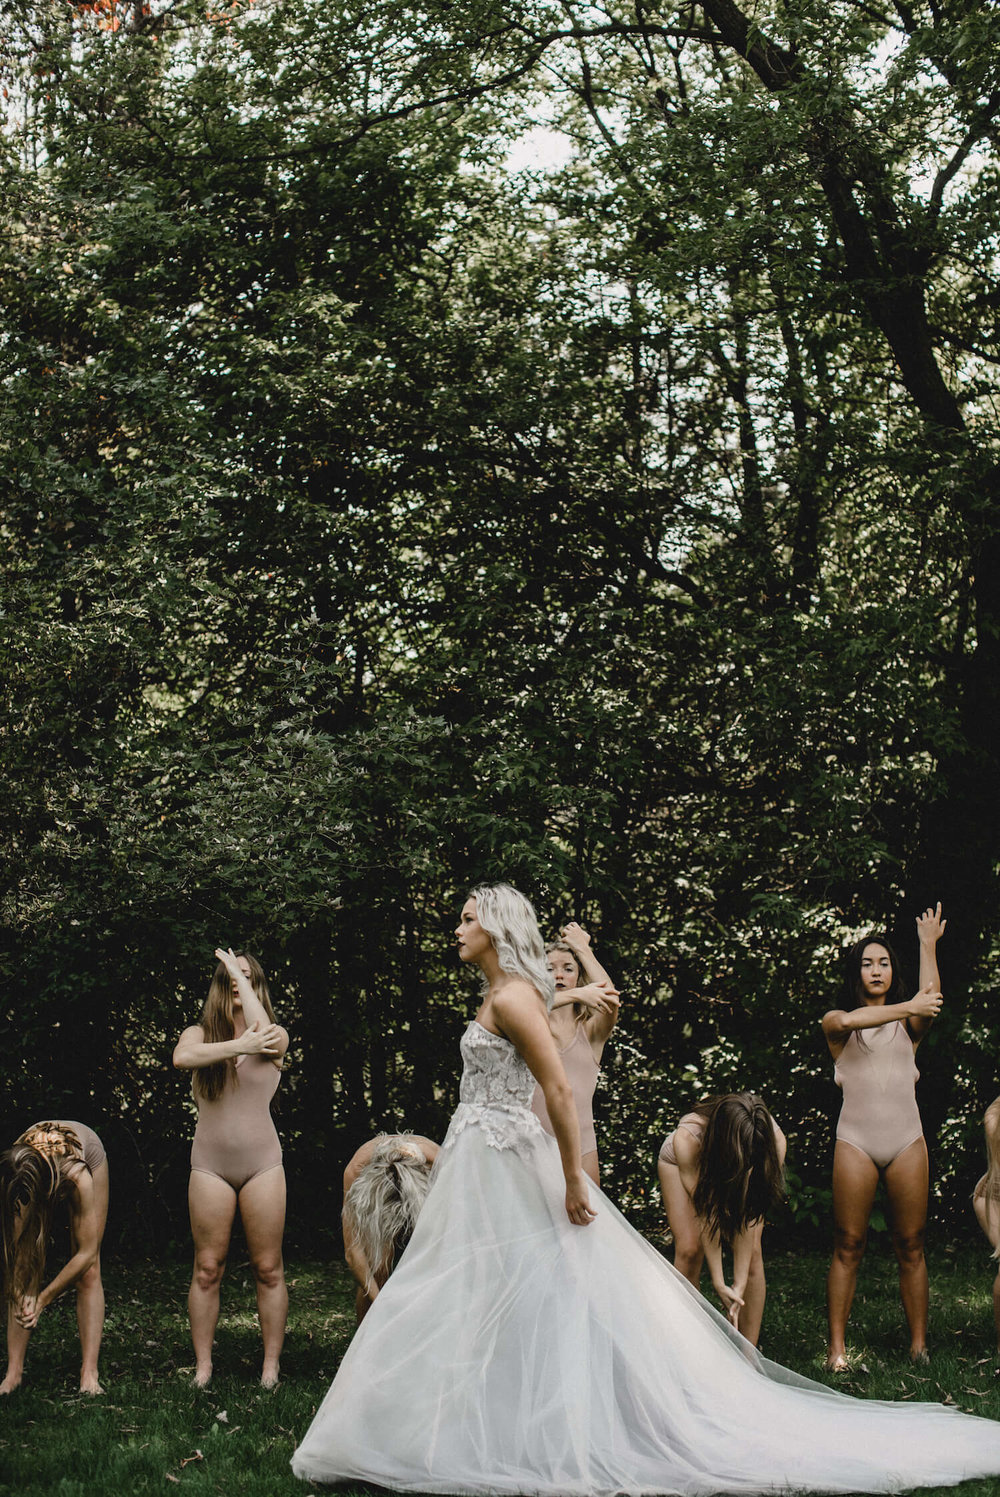 acowsay-cinema-tara-latour-wedding-designer-bts- (14 of 124).jpg